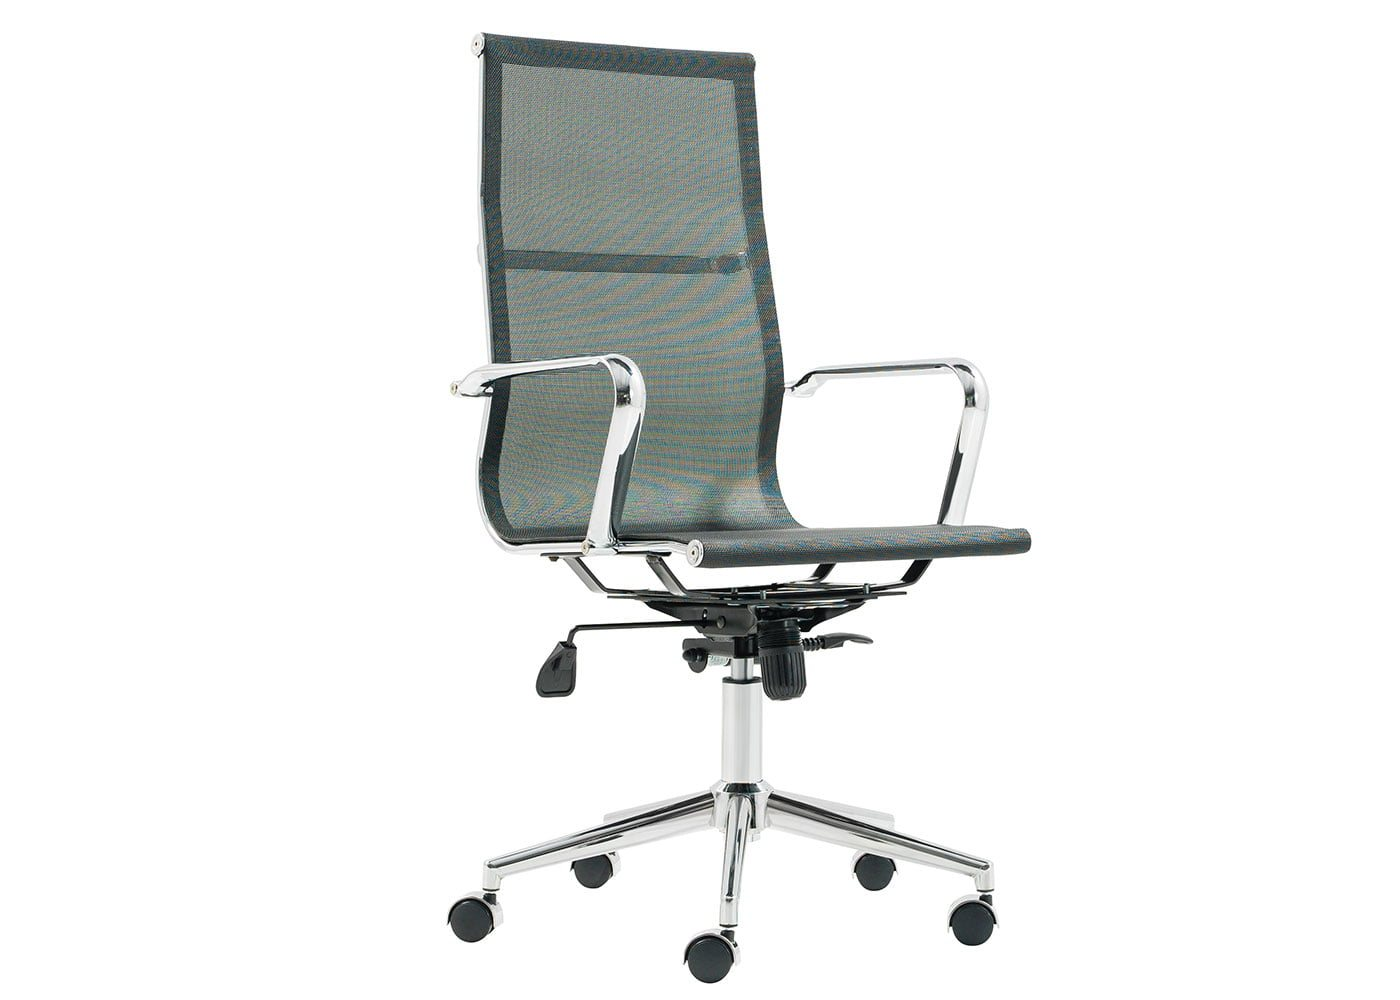 kristal-summer-ofis-koltuğu-ofis-mobilyasi-bursa-1